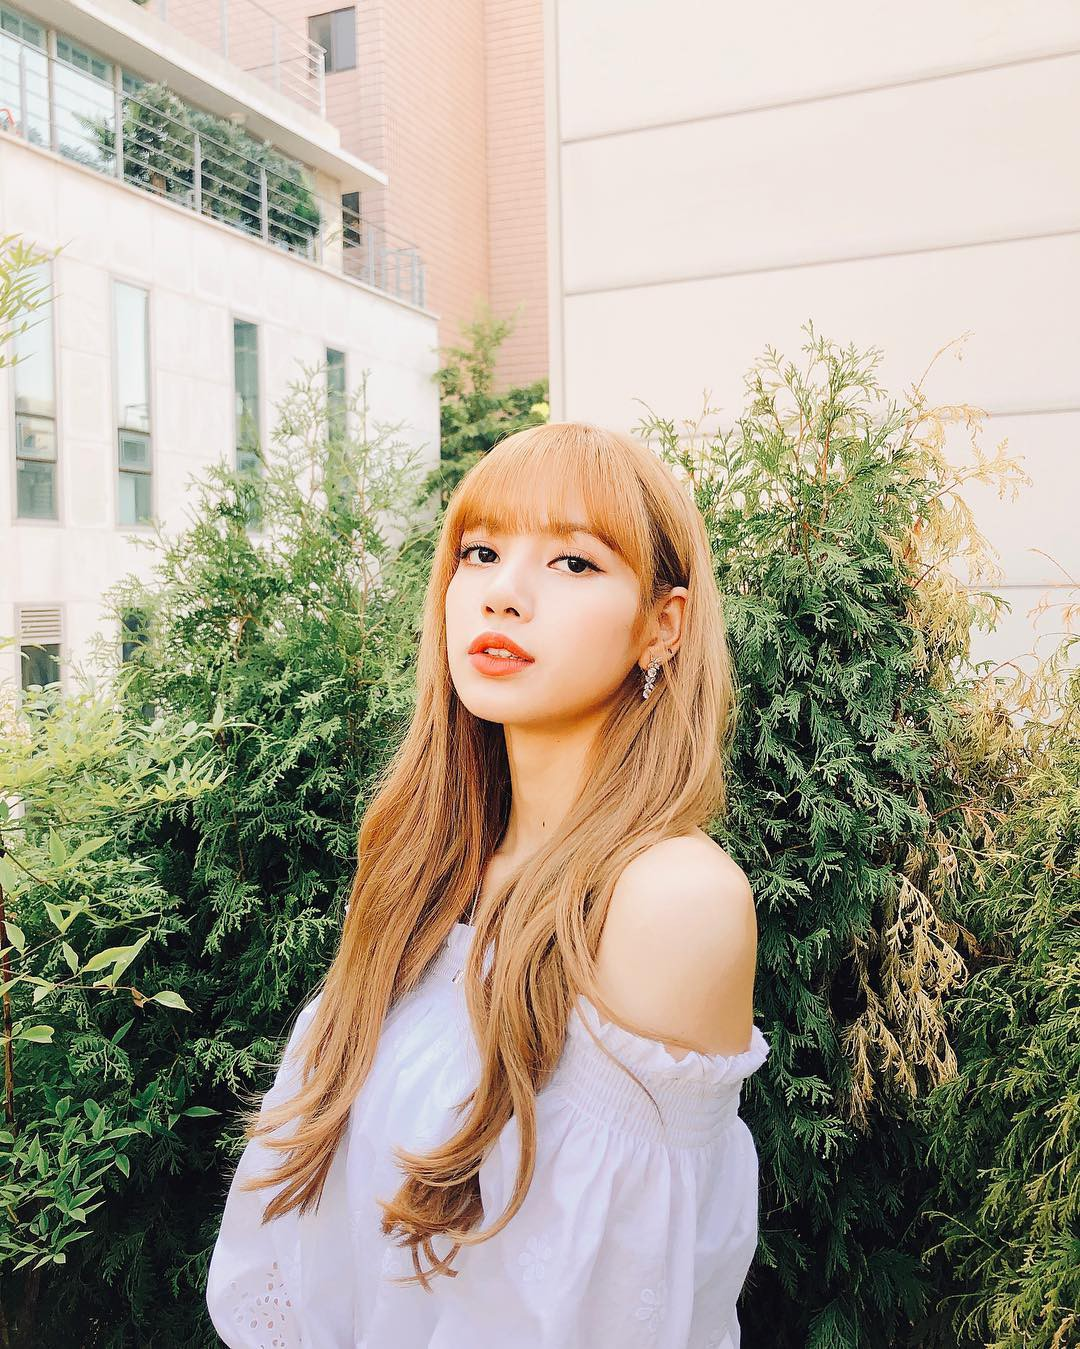 Controversy Against Jennie, Short-cut Short Hair of Lisa (Black Pink) - Photos 2.